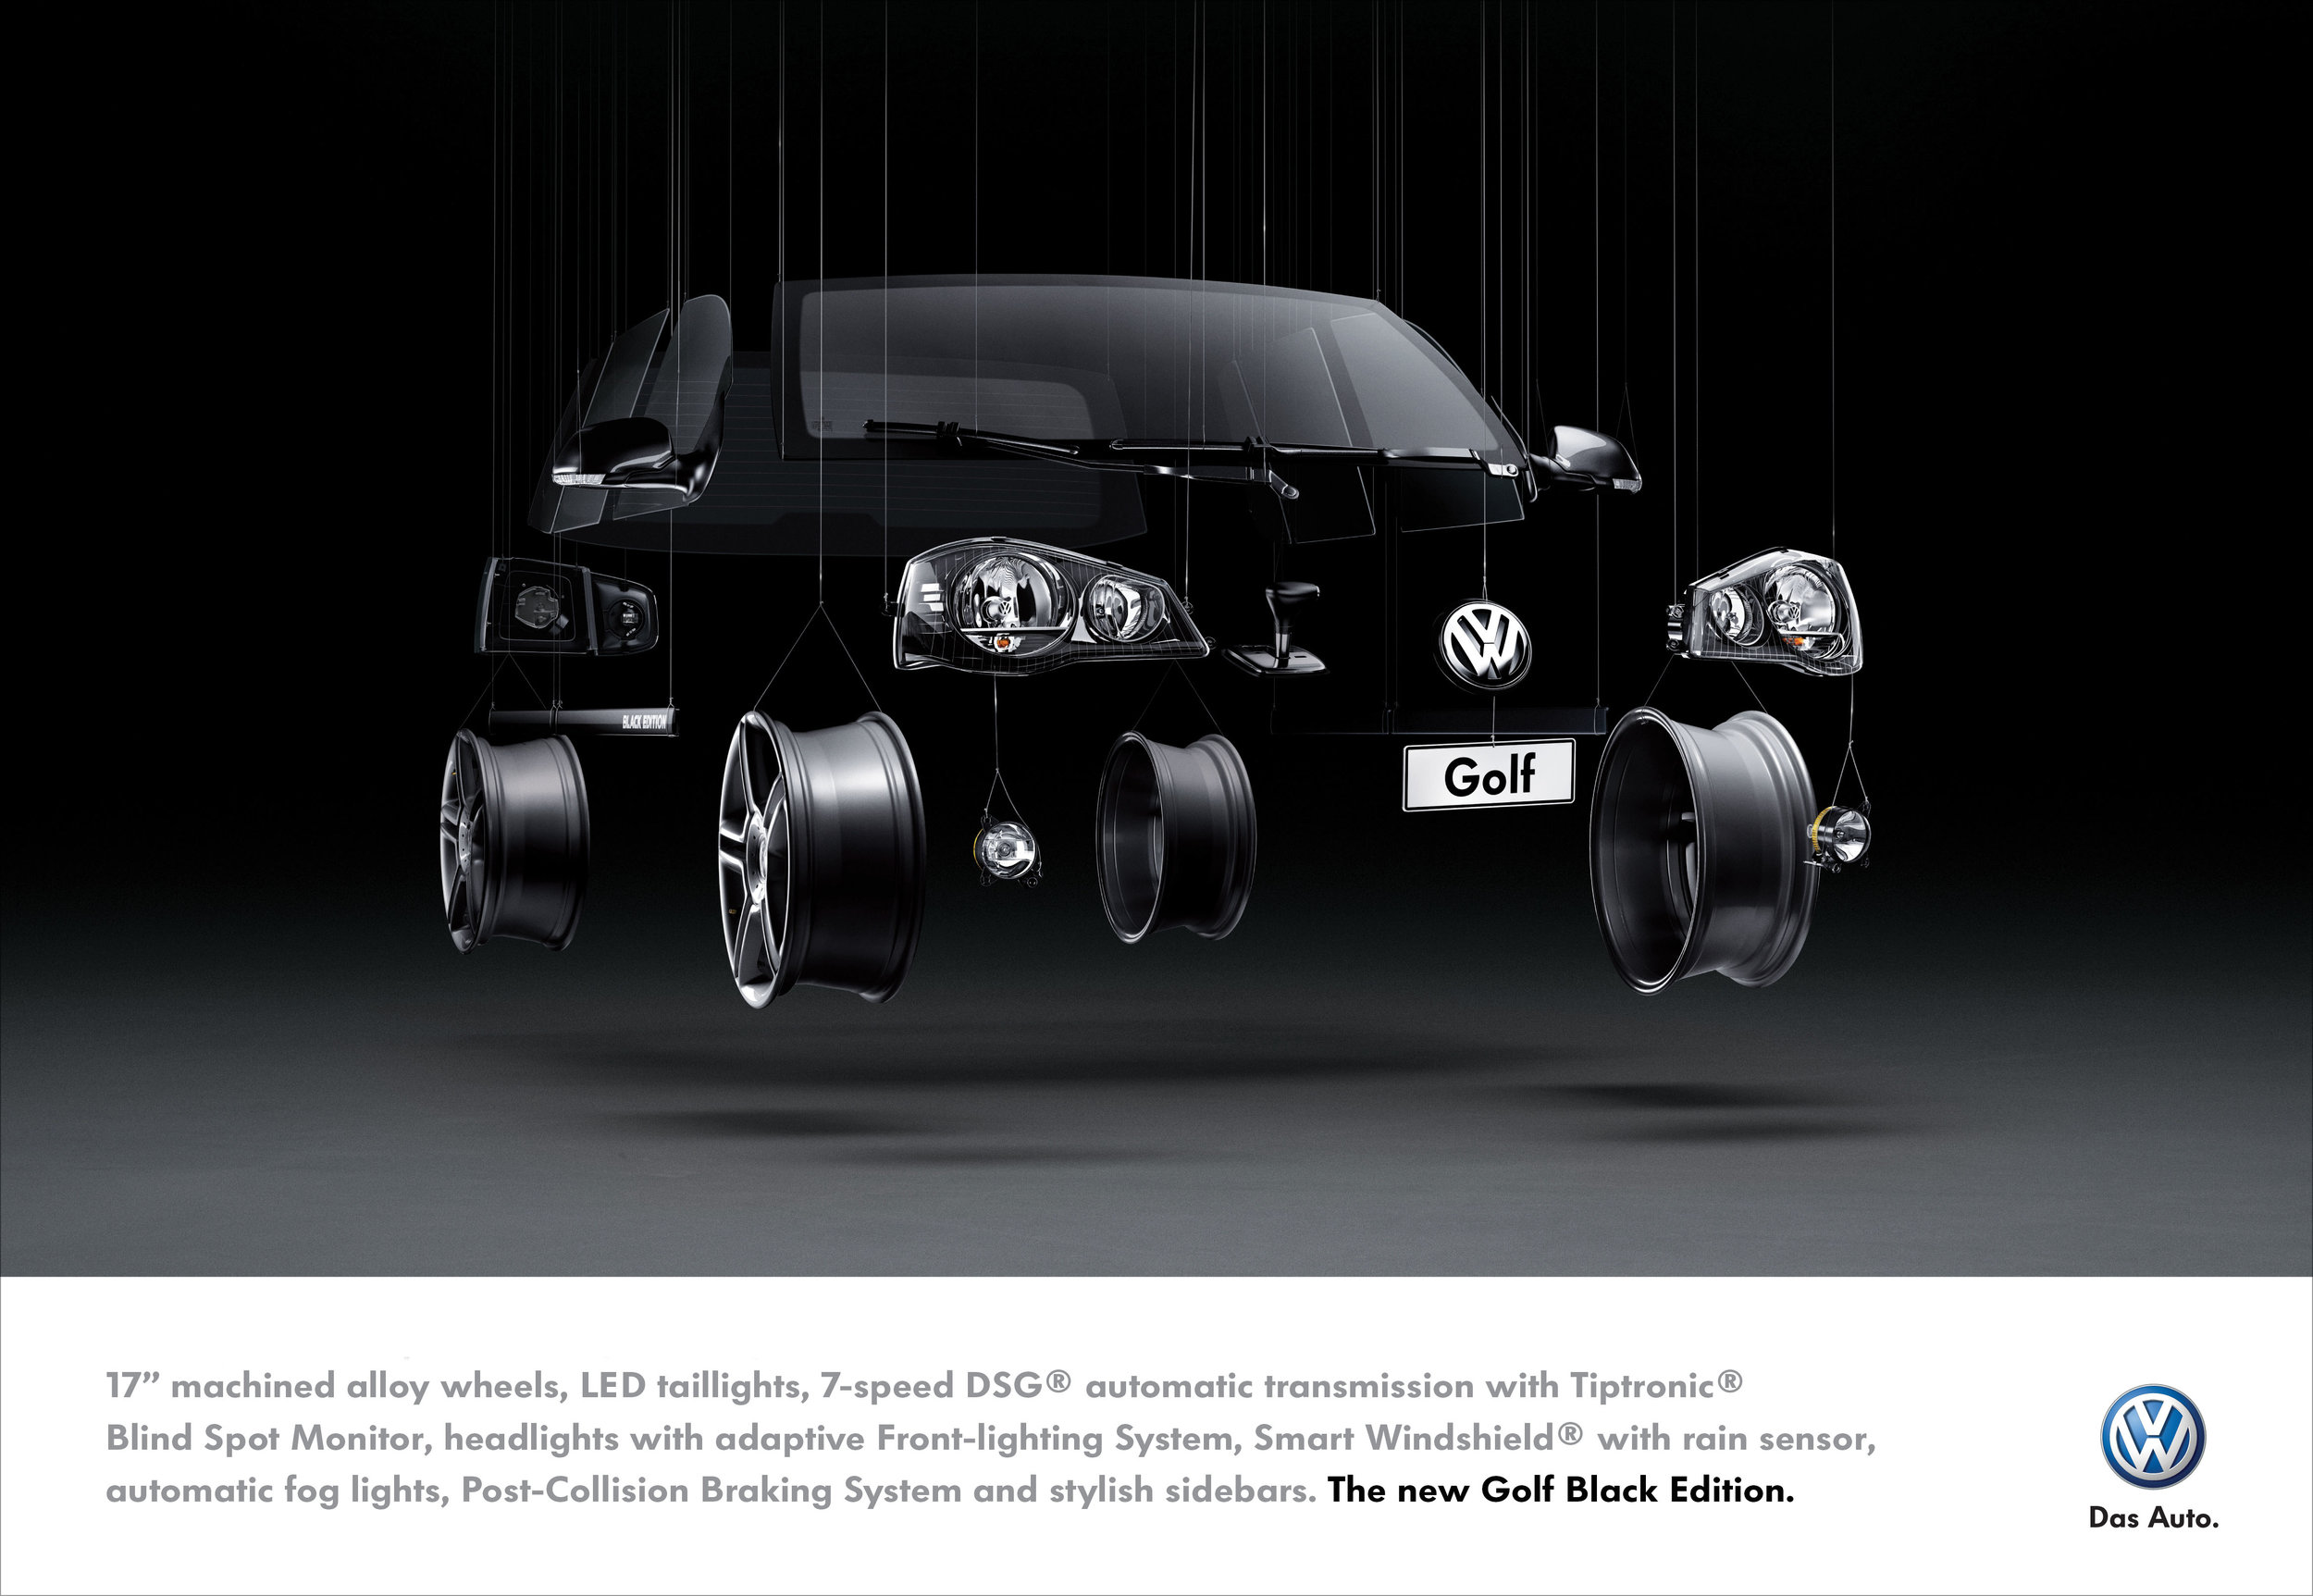 VW - Golf Black English.jpg